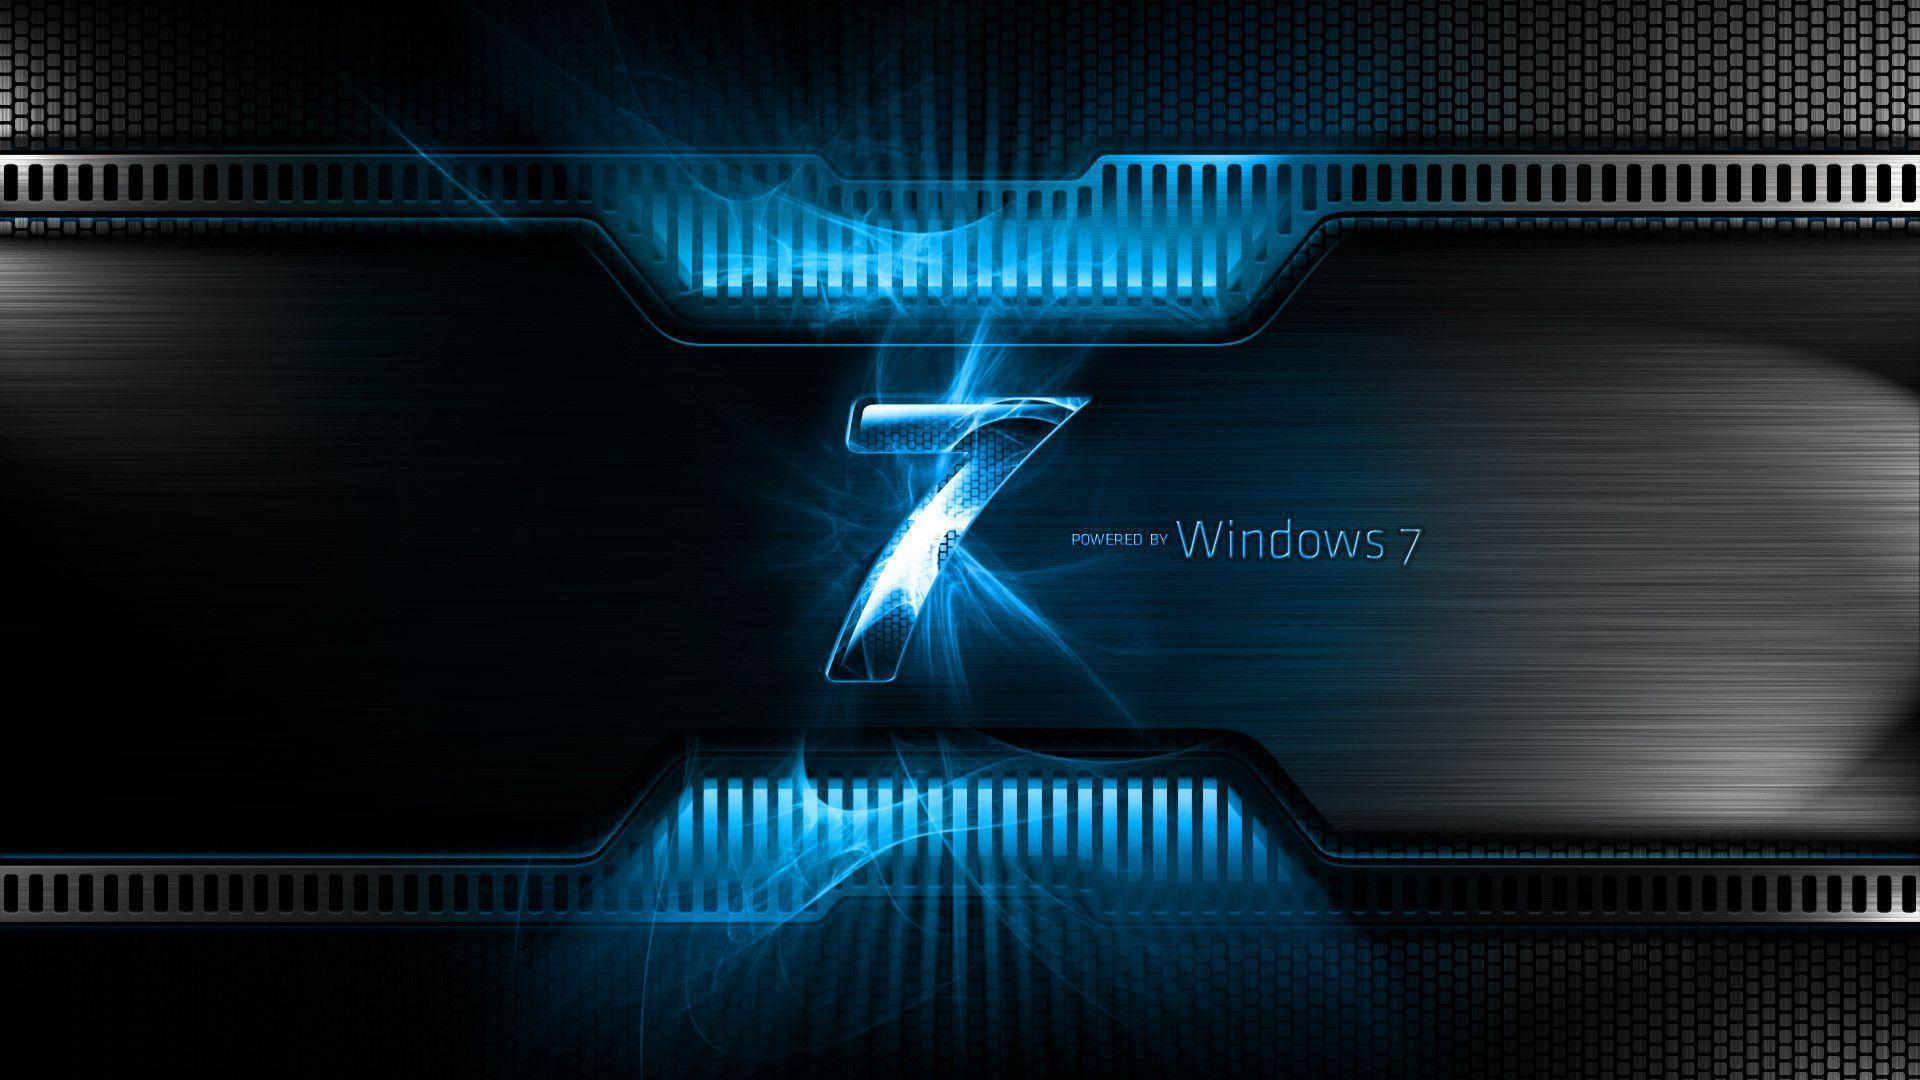 Windows 7 Ultimate Desktop Backgrounds Wallpaper Cave